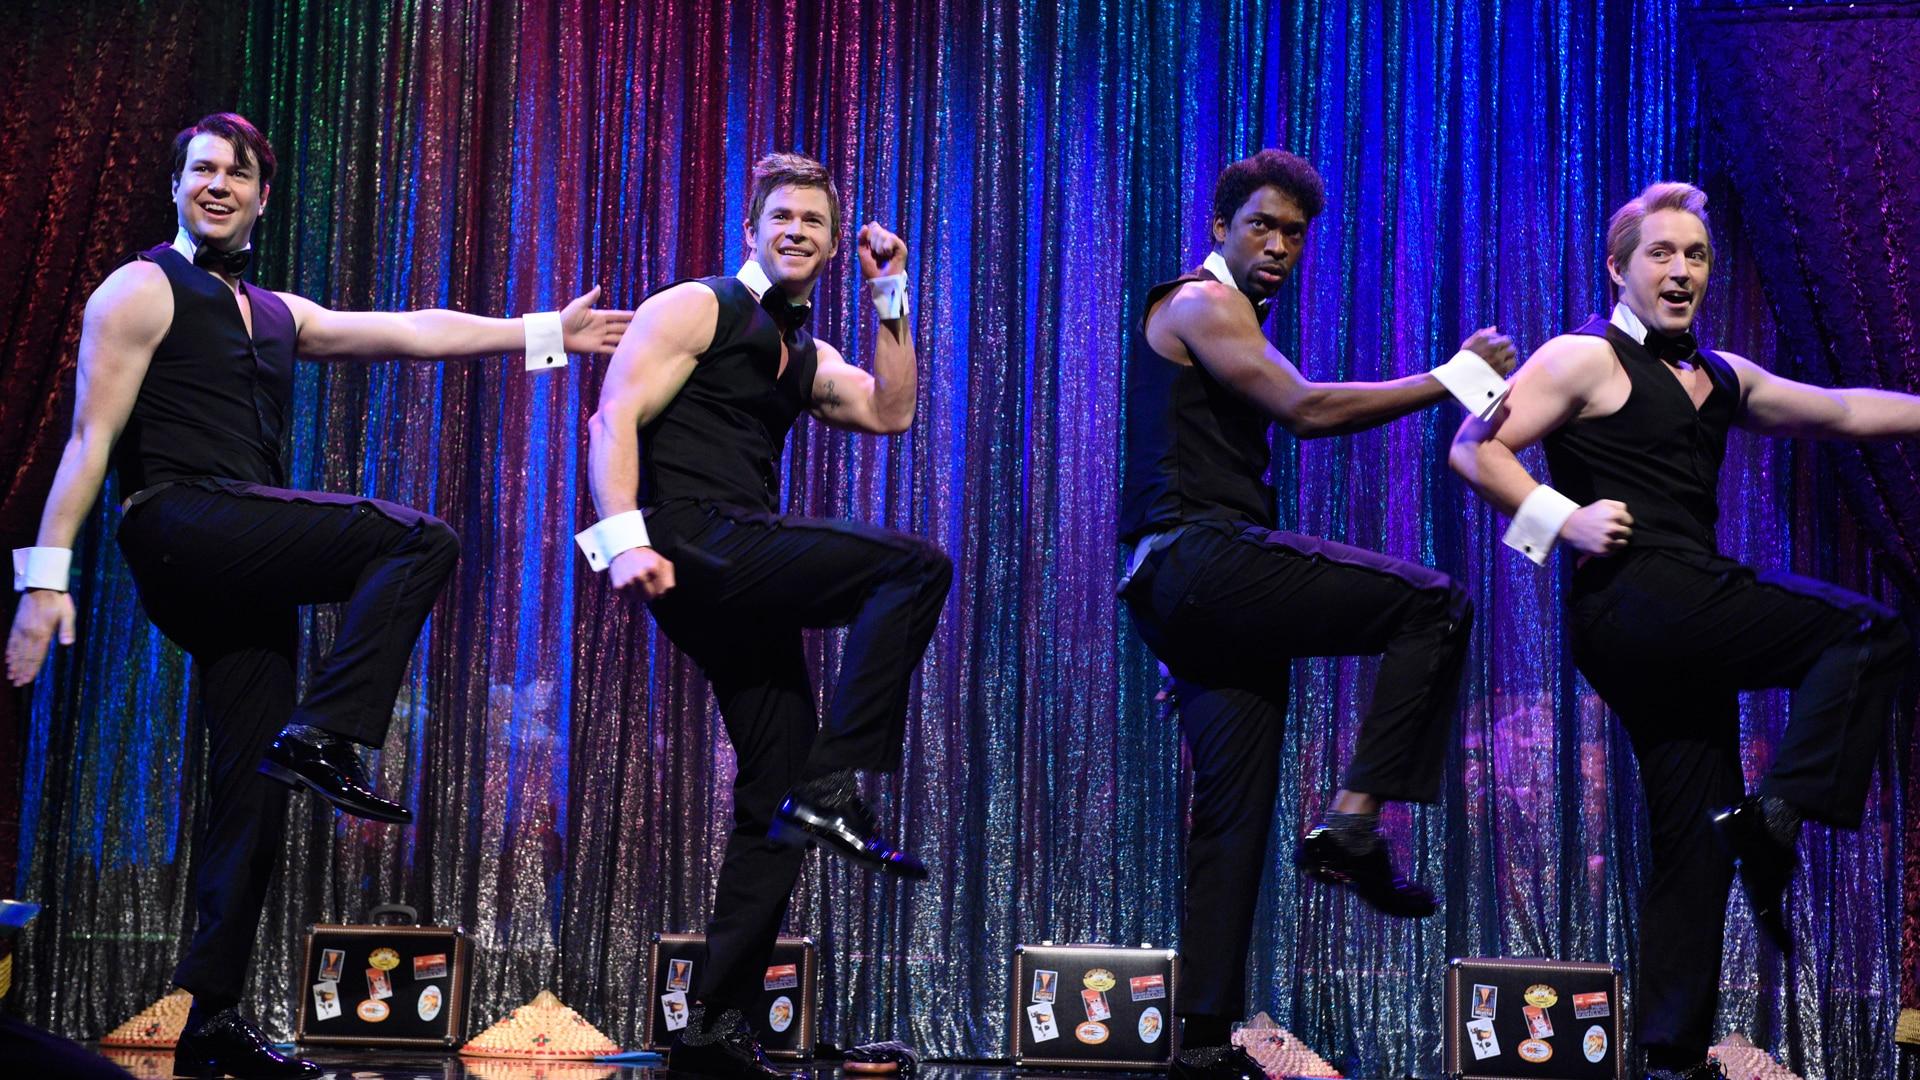 Strip male dance